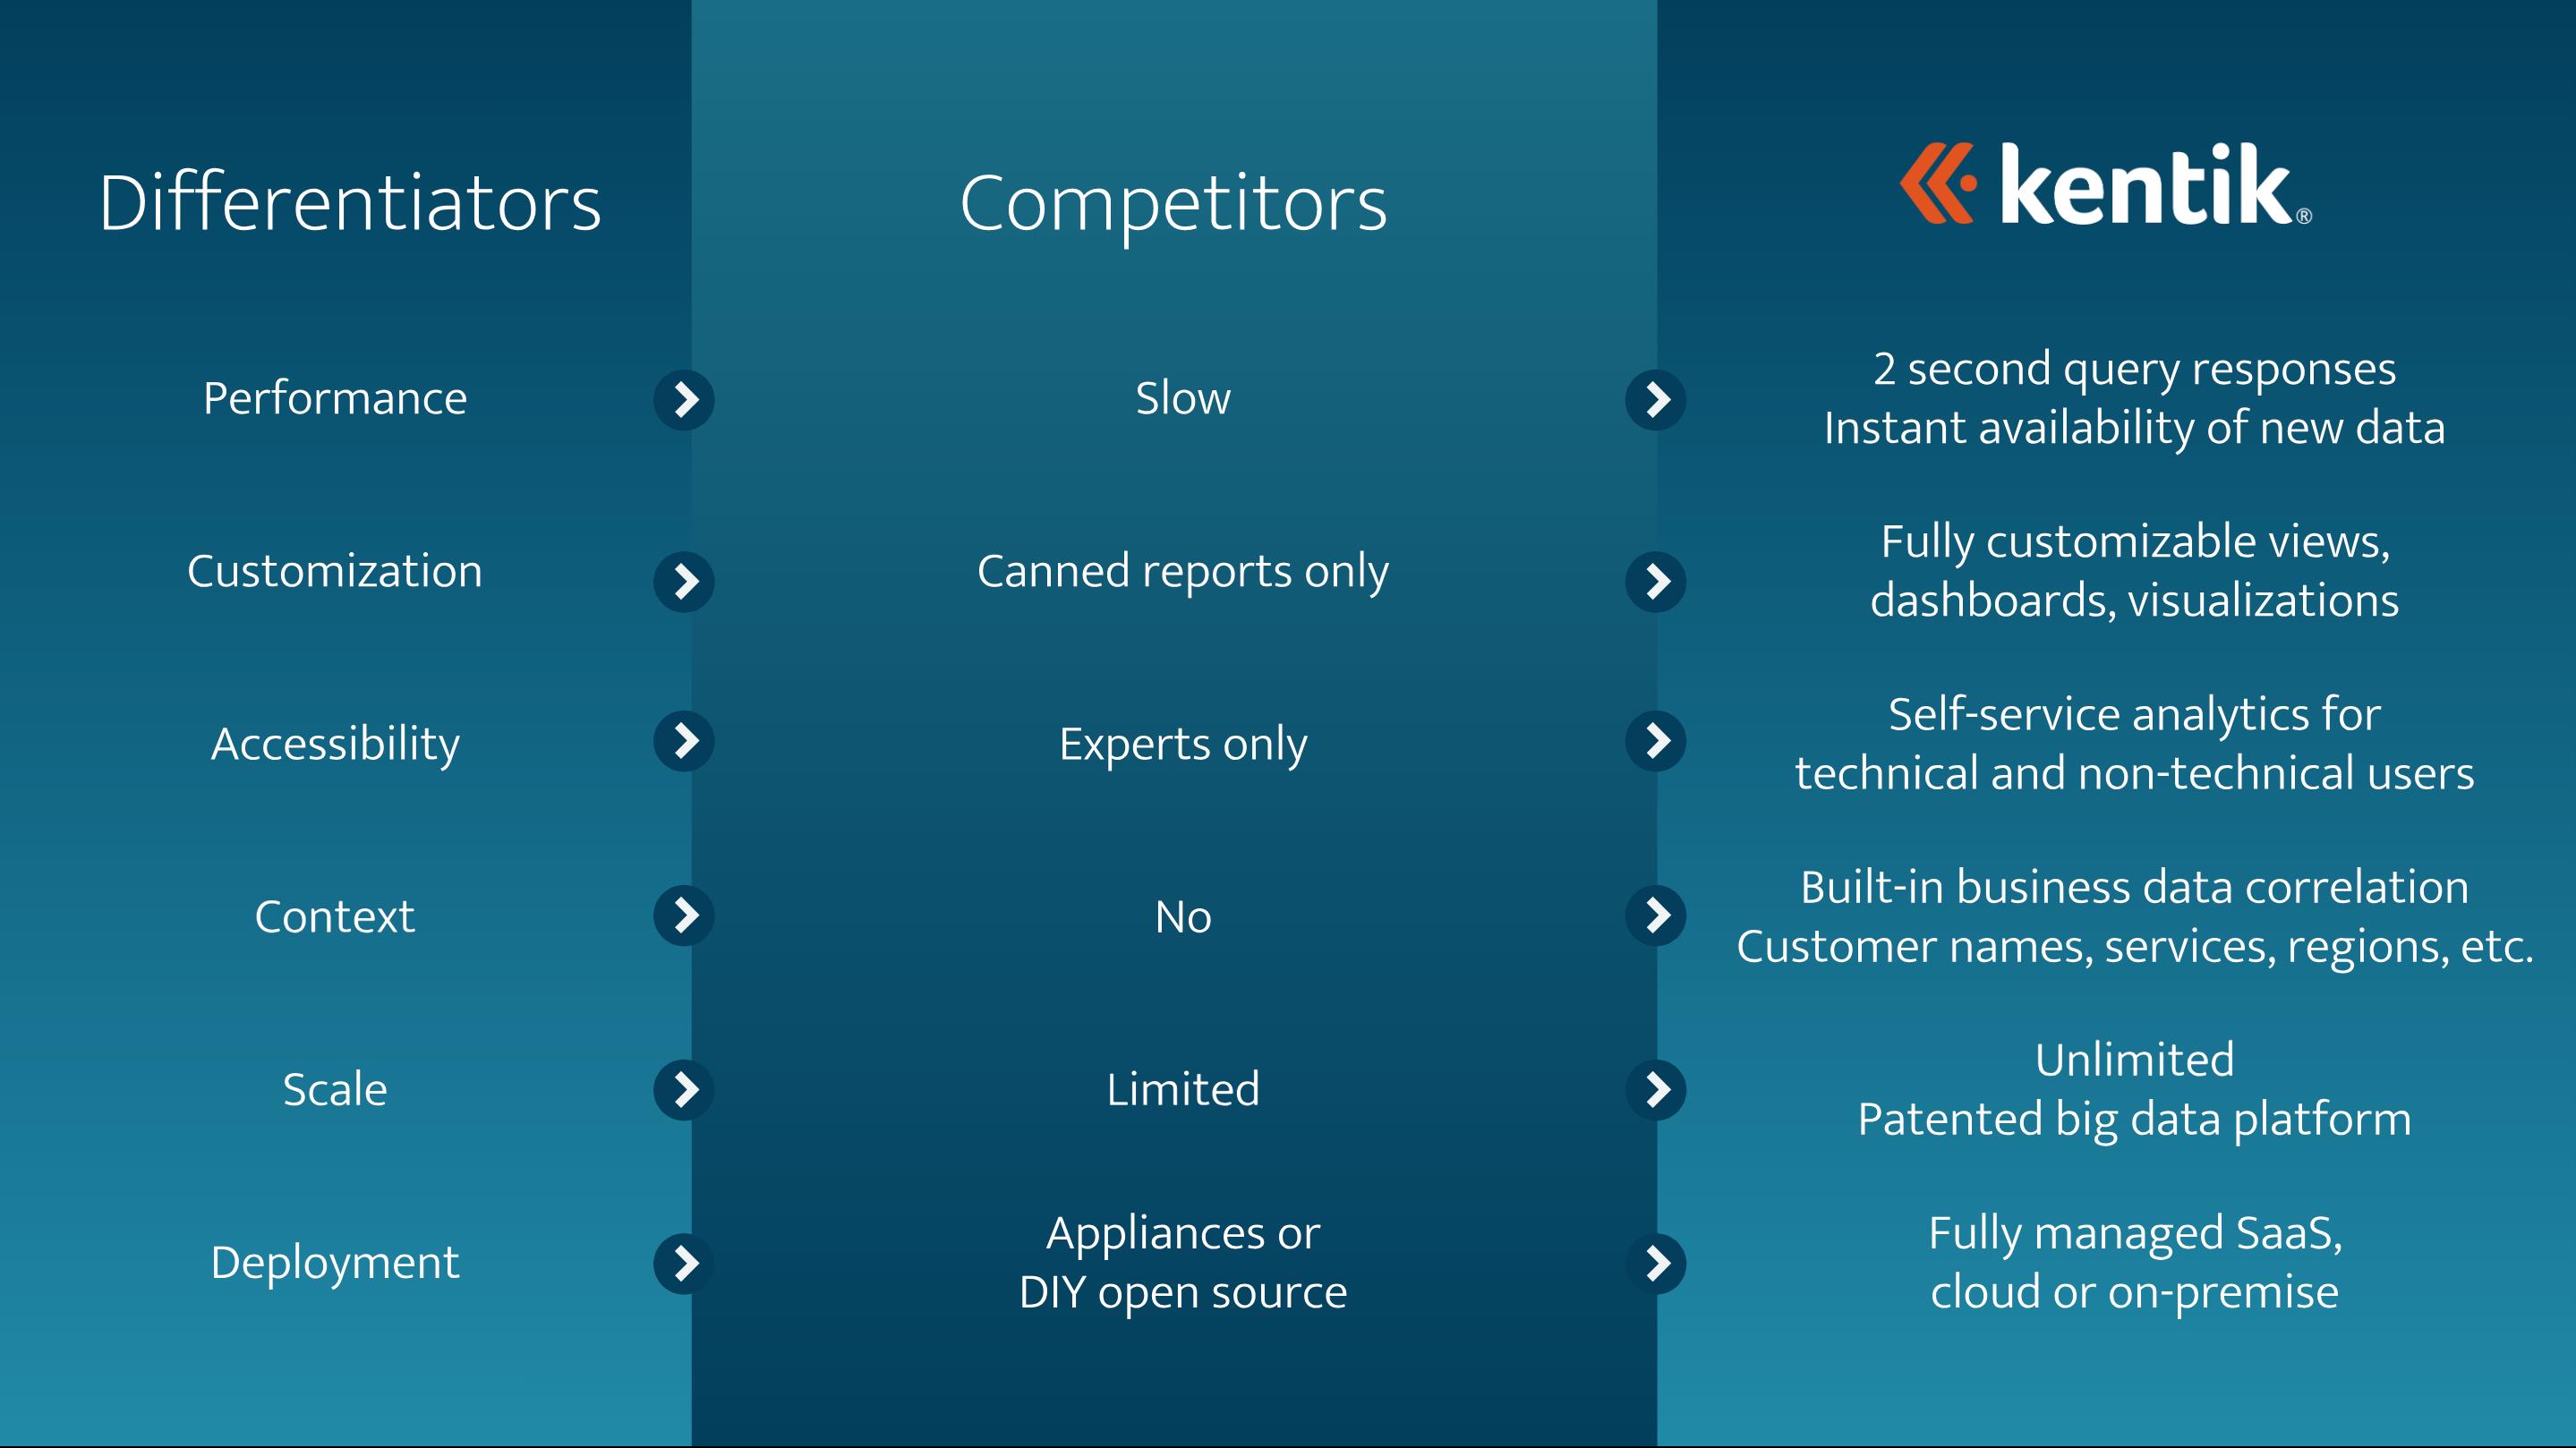 Kentik Differentiators versus similar products